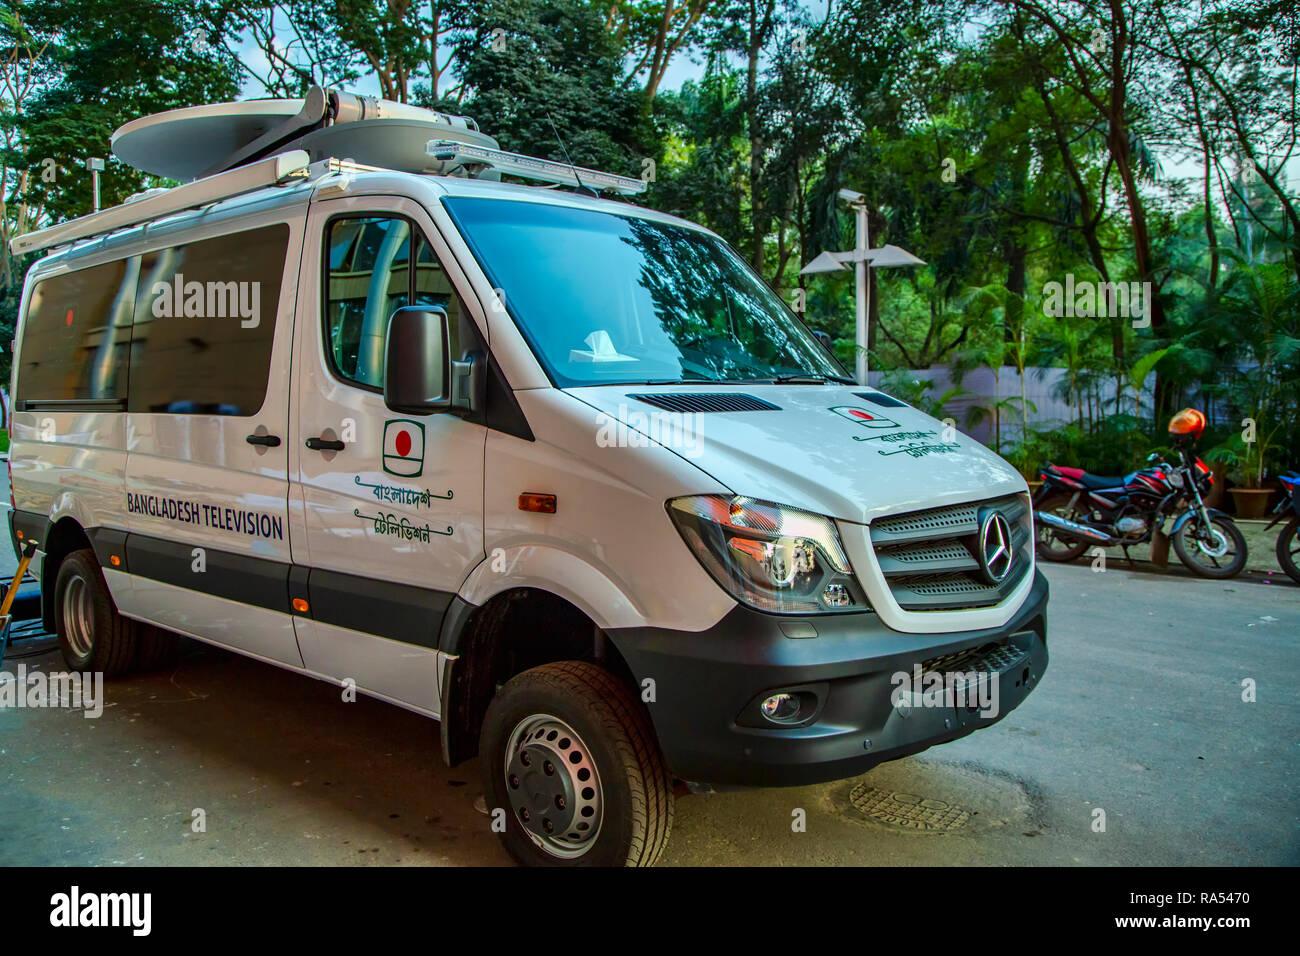 Bangladesh Television BTV Mercedes Benz Sprinter Outside Broadcast Van - Stock Image